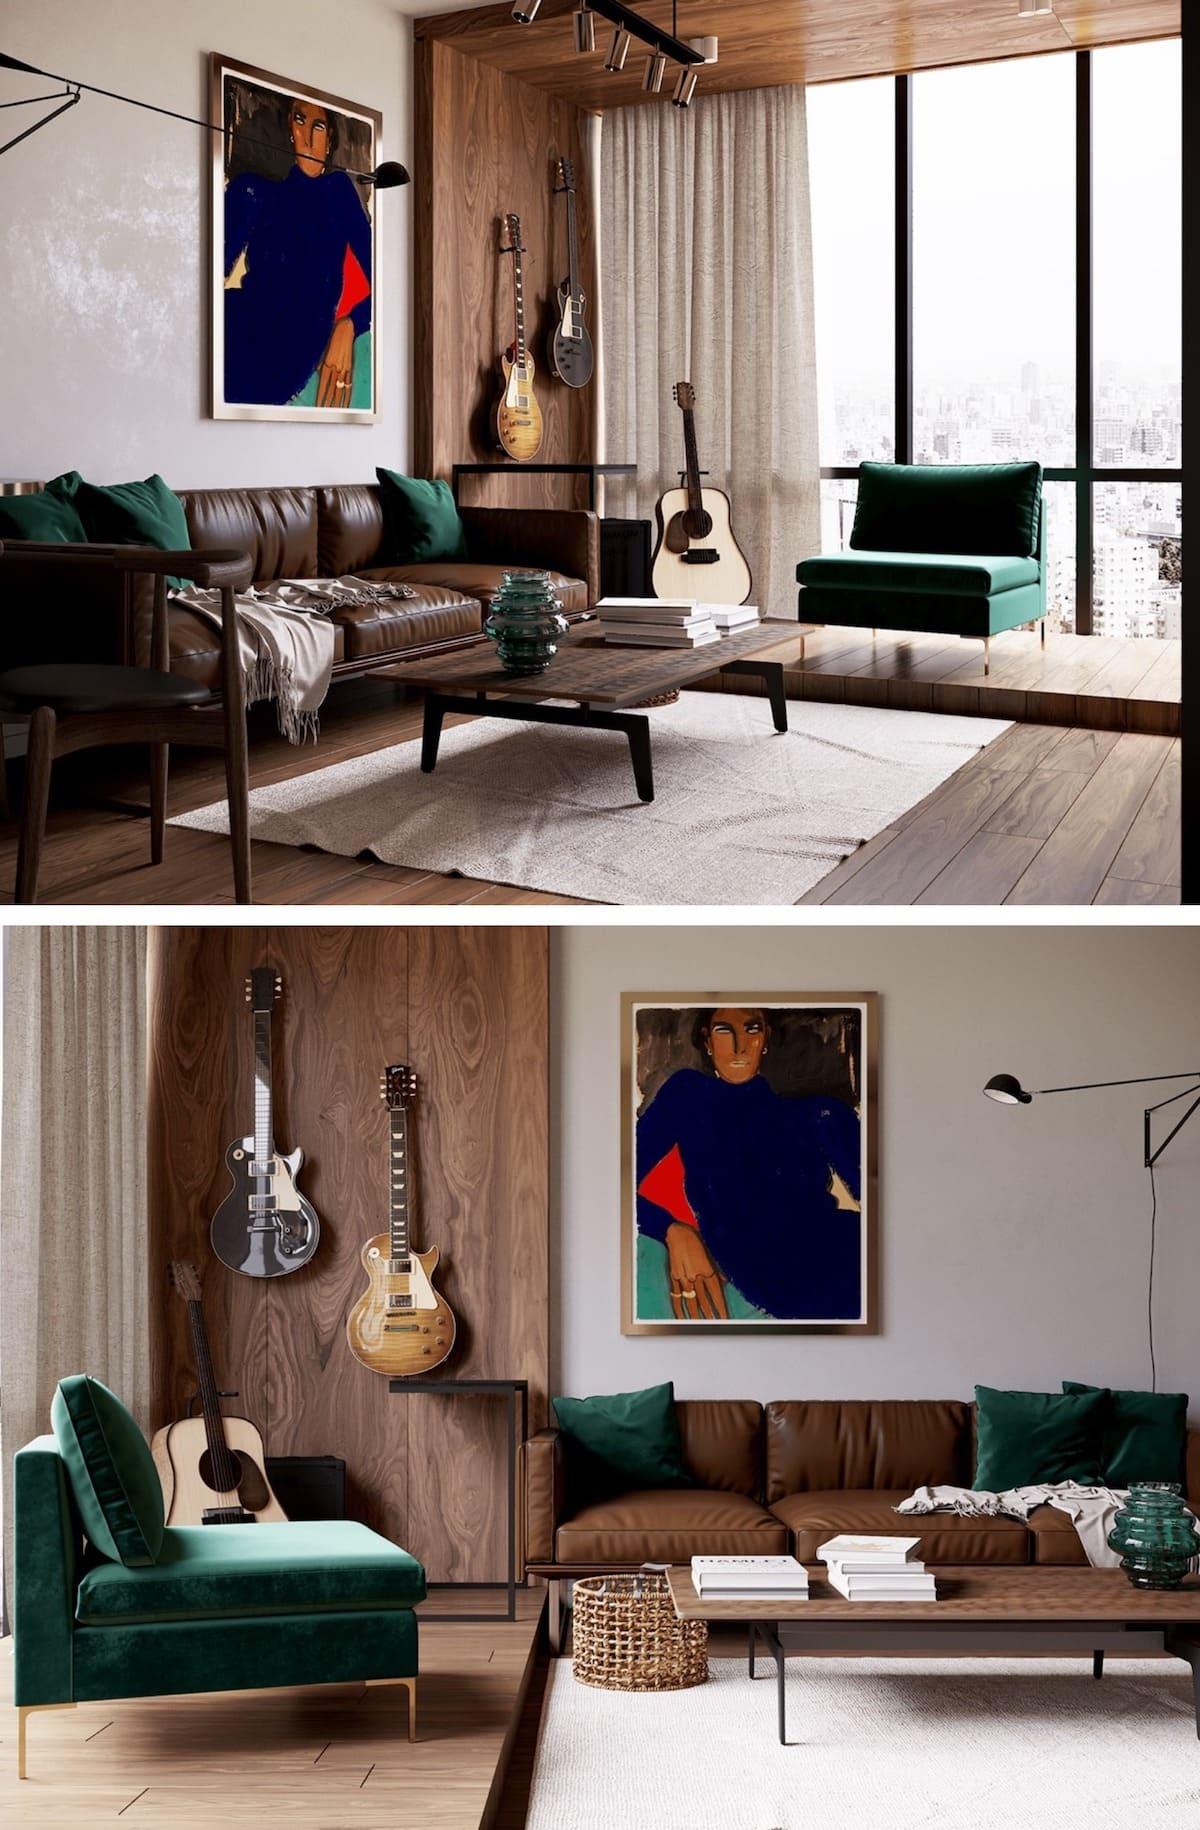 дизайн интерьера модной квартиры фото 63